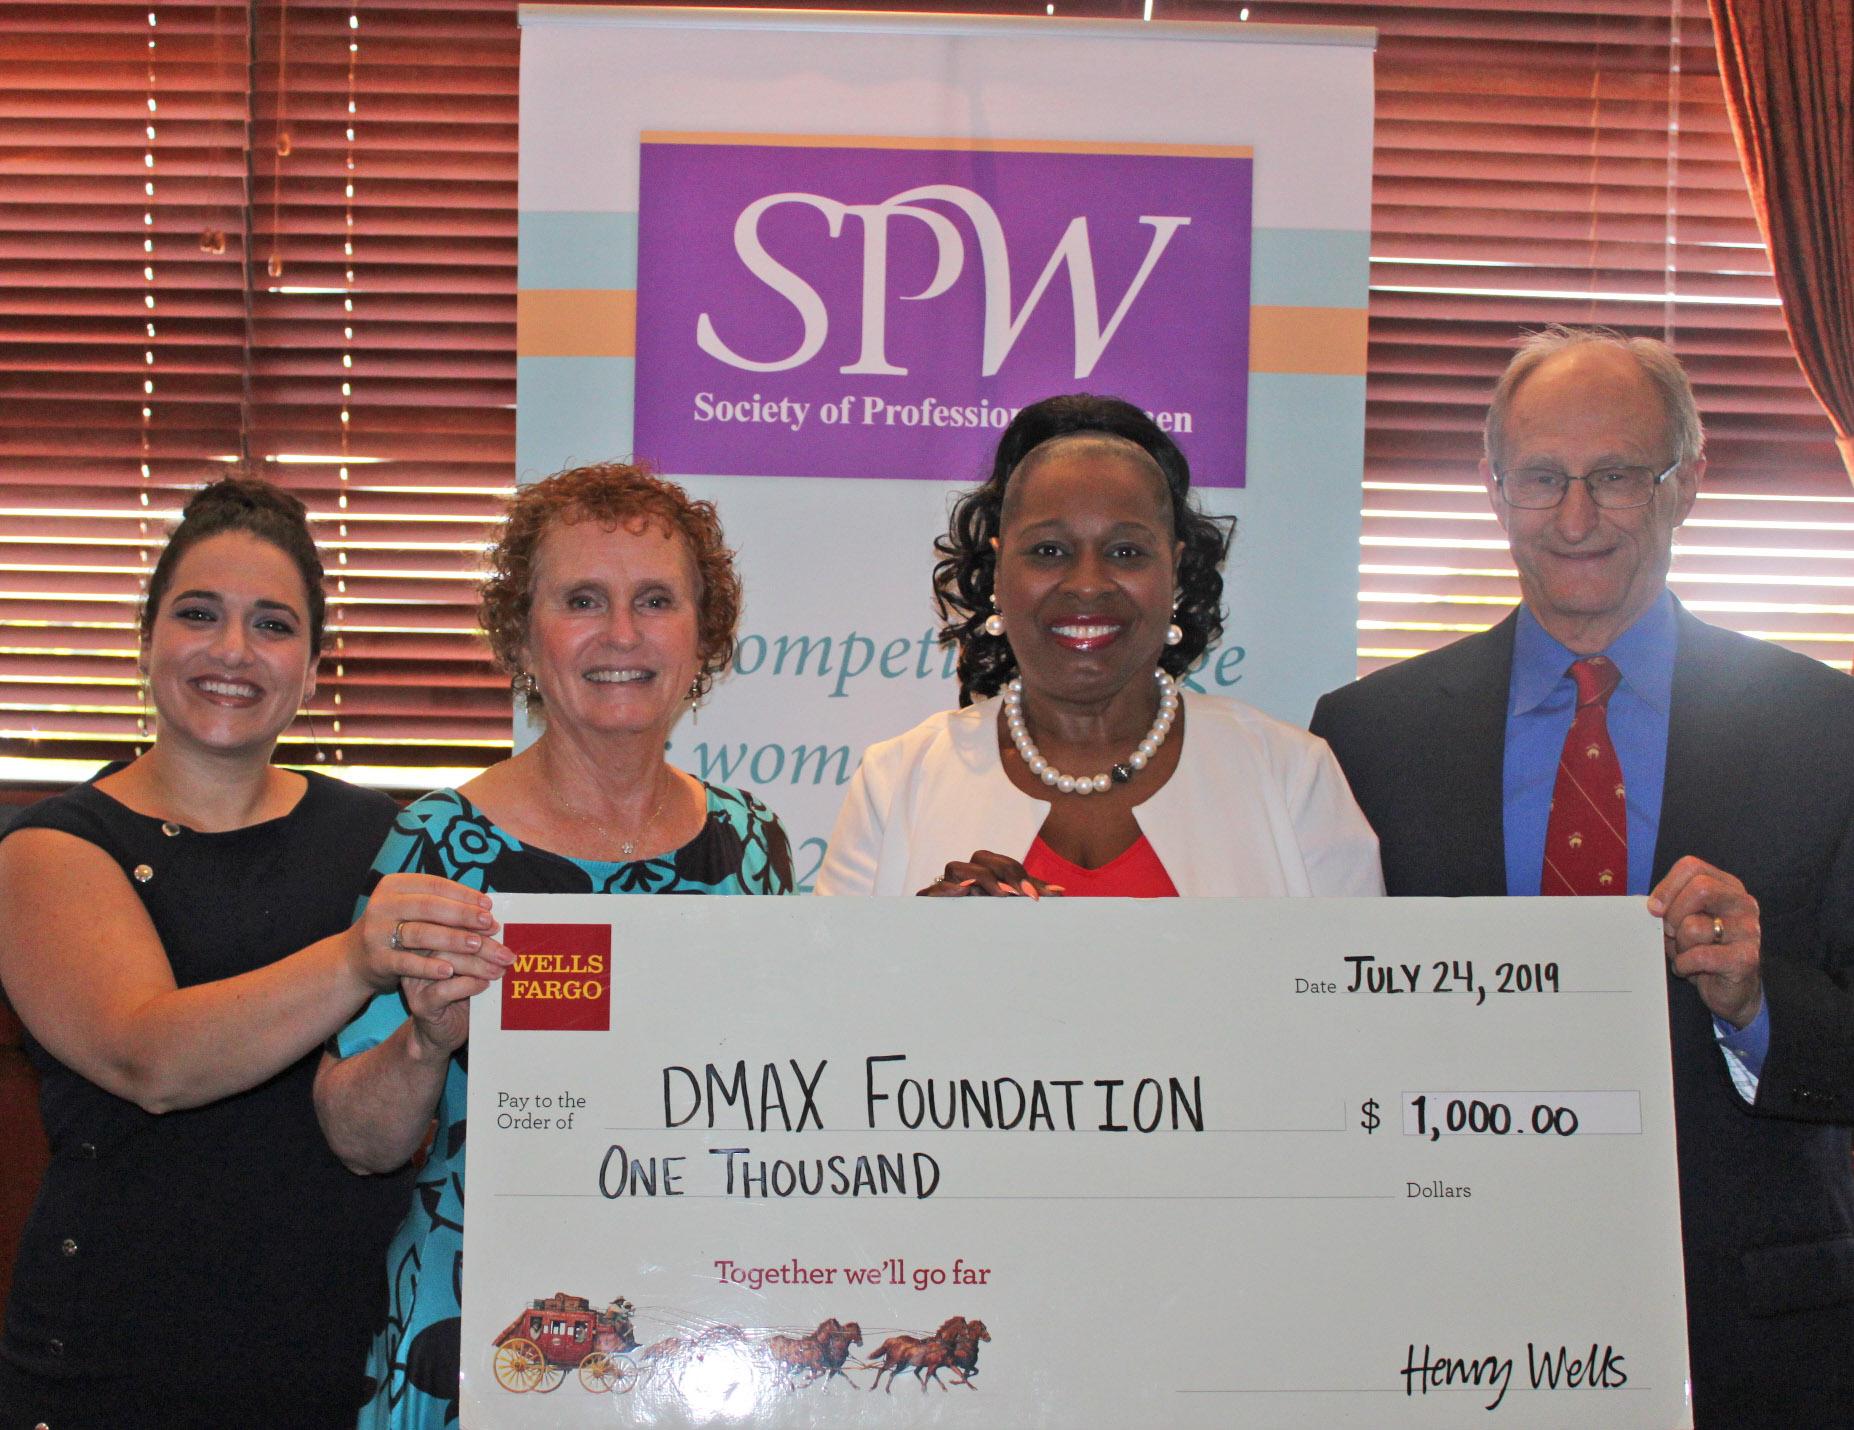 Featured Non-Profit: DMAX Foundation